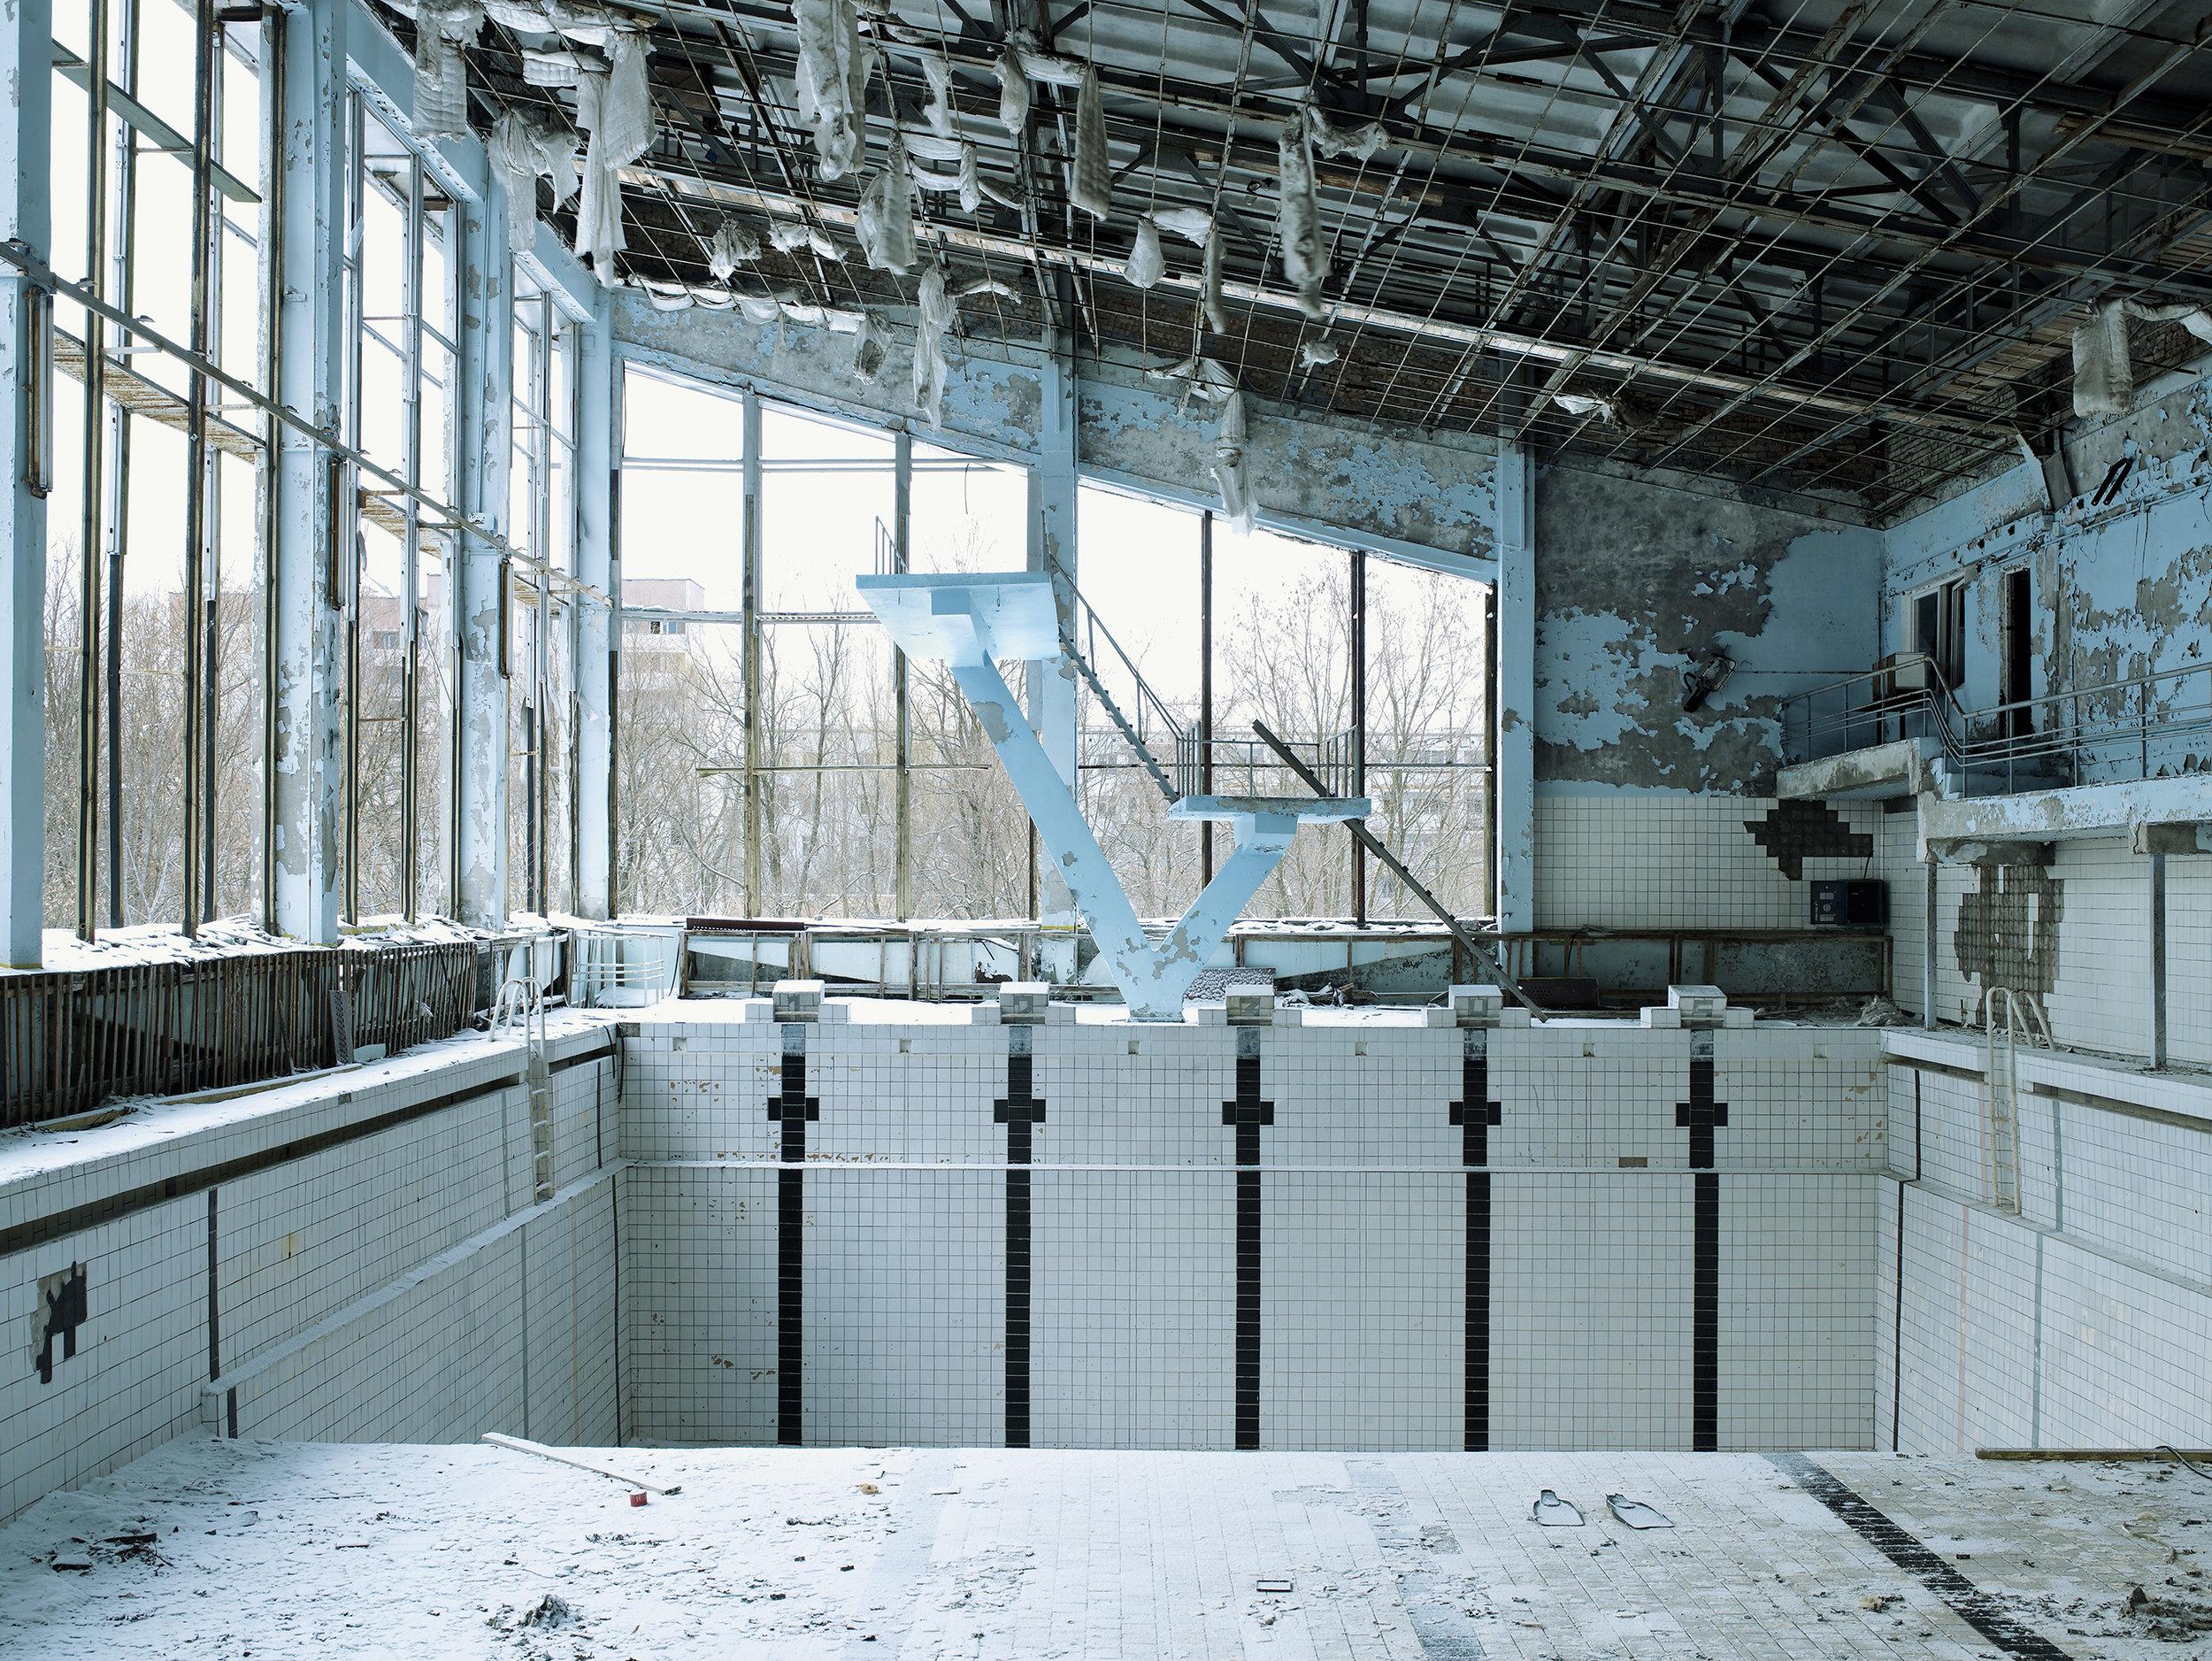 Tchernobyl 3. Swimming pool, Prypiat, Ukraine, 2007.